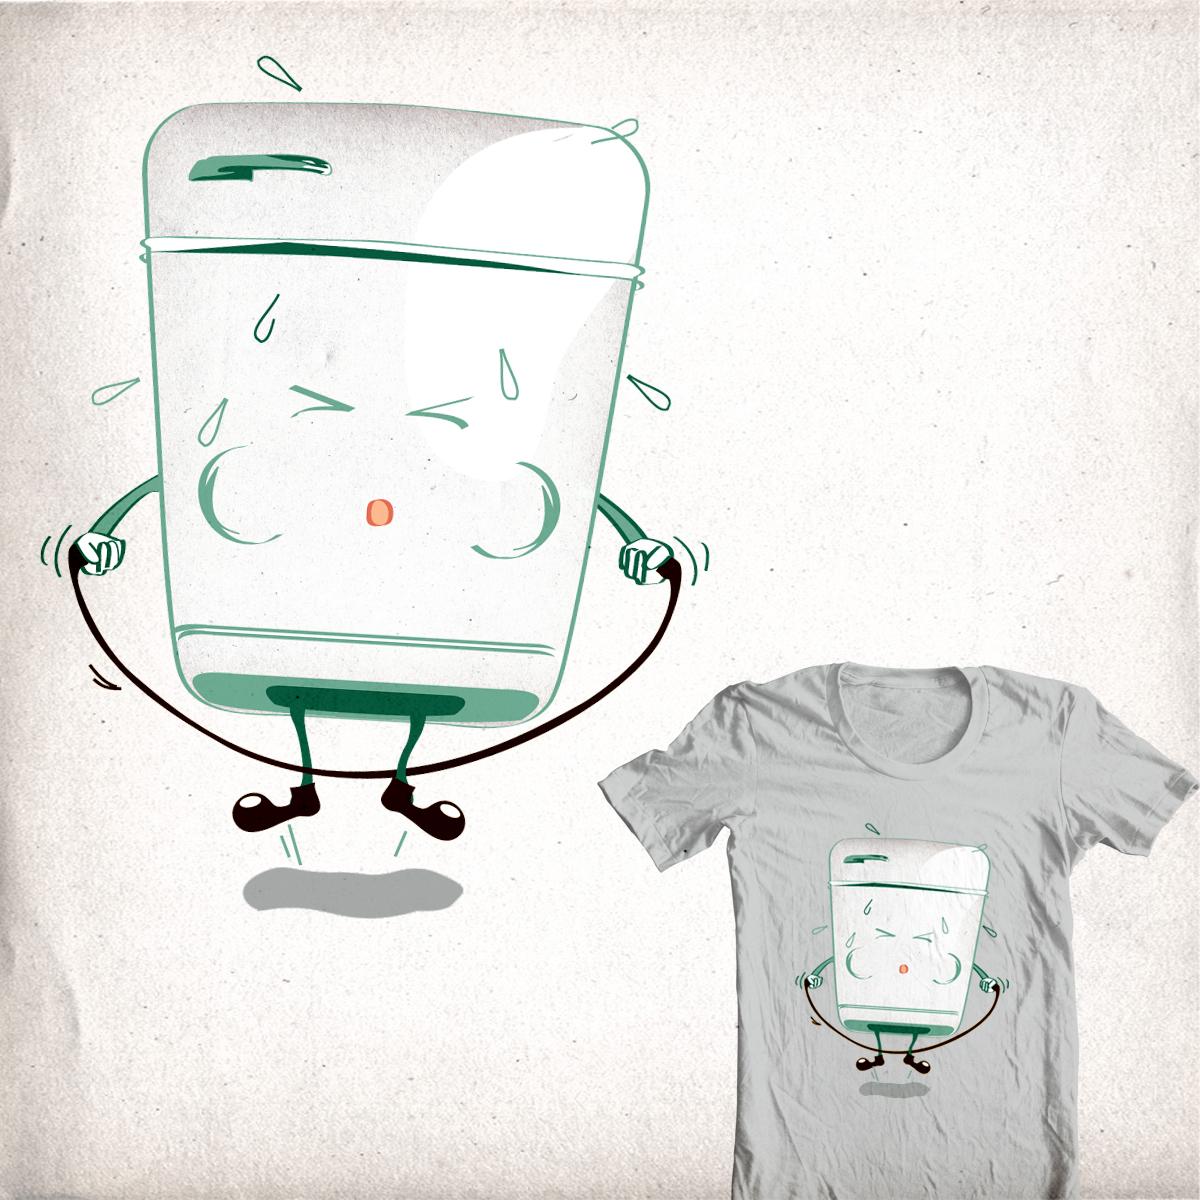 Cooler by masslos.org on Threadless